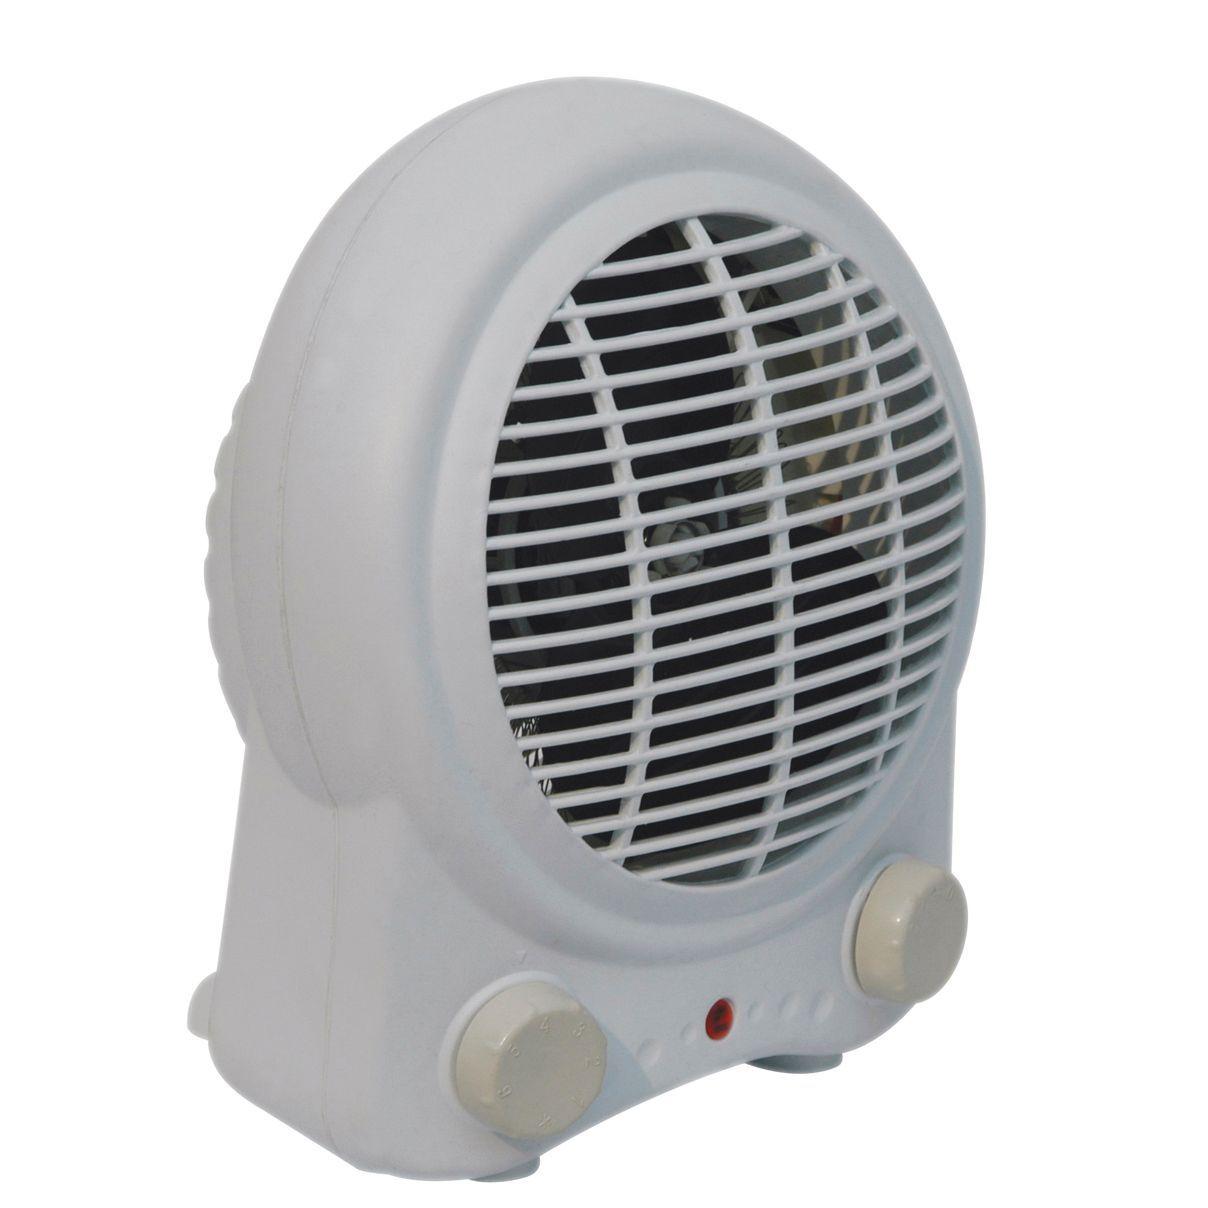 B Amp Q Electric 2000w White Fan Heater Departments Diy At B Amp Q